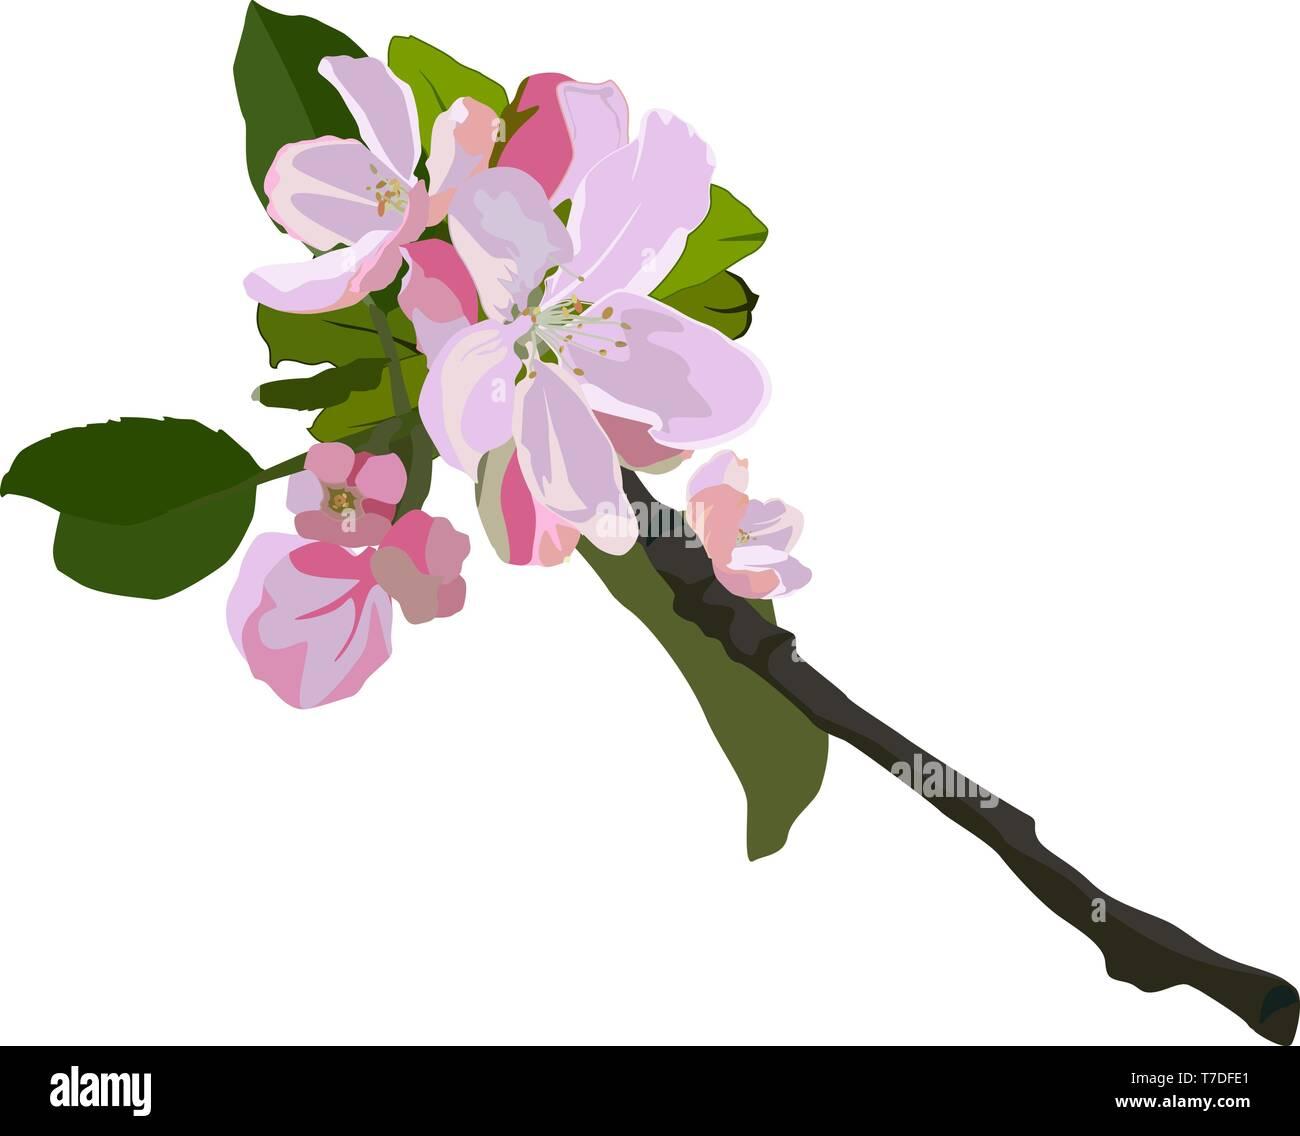 Apple tree branch in blossom, vector isolated illustration - Stock Vector